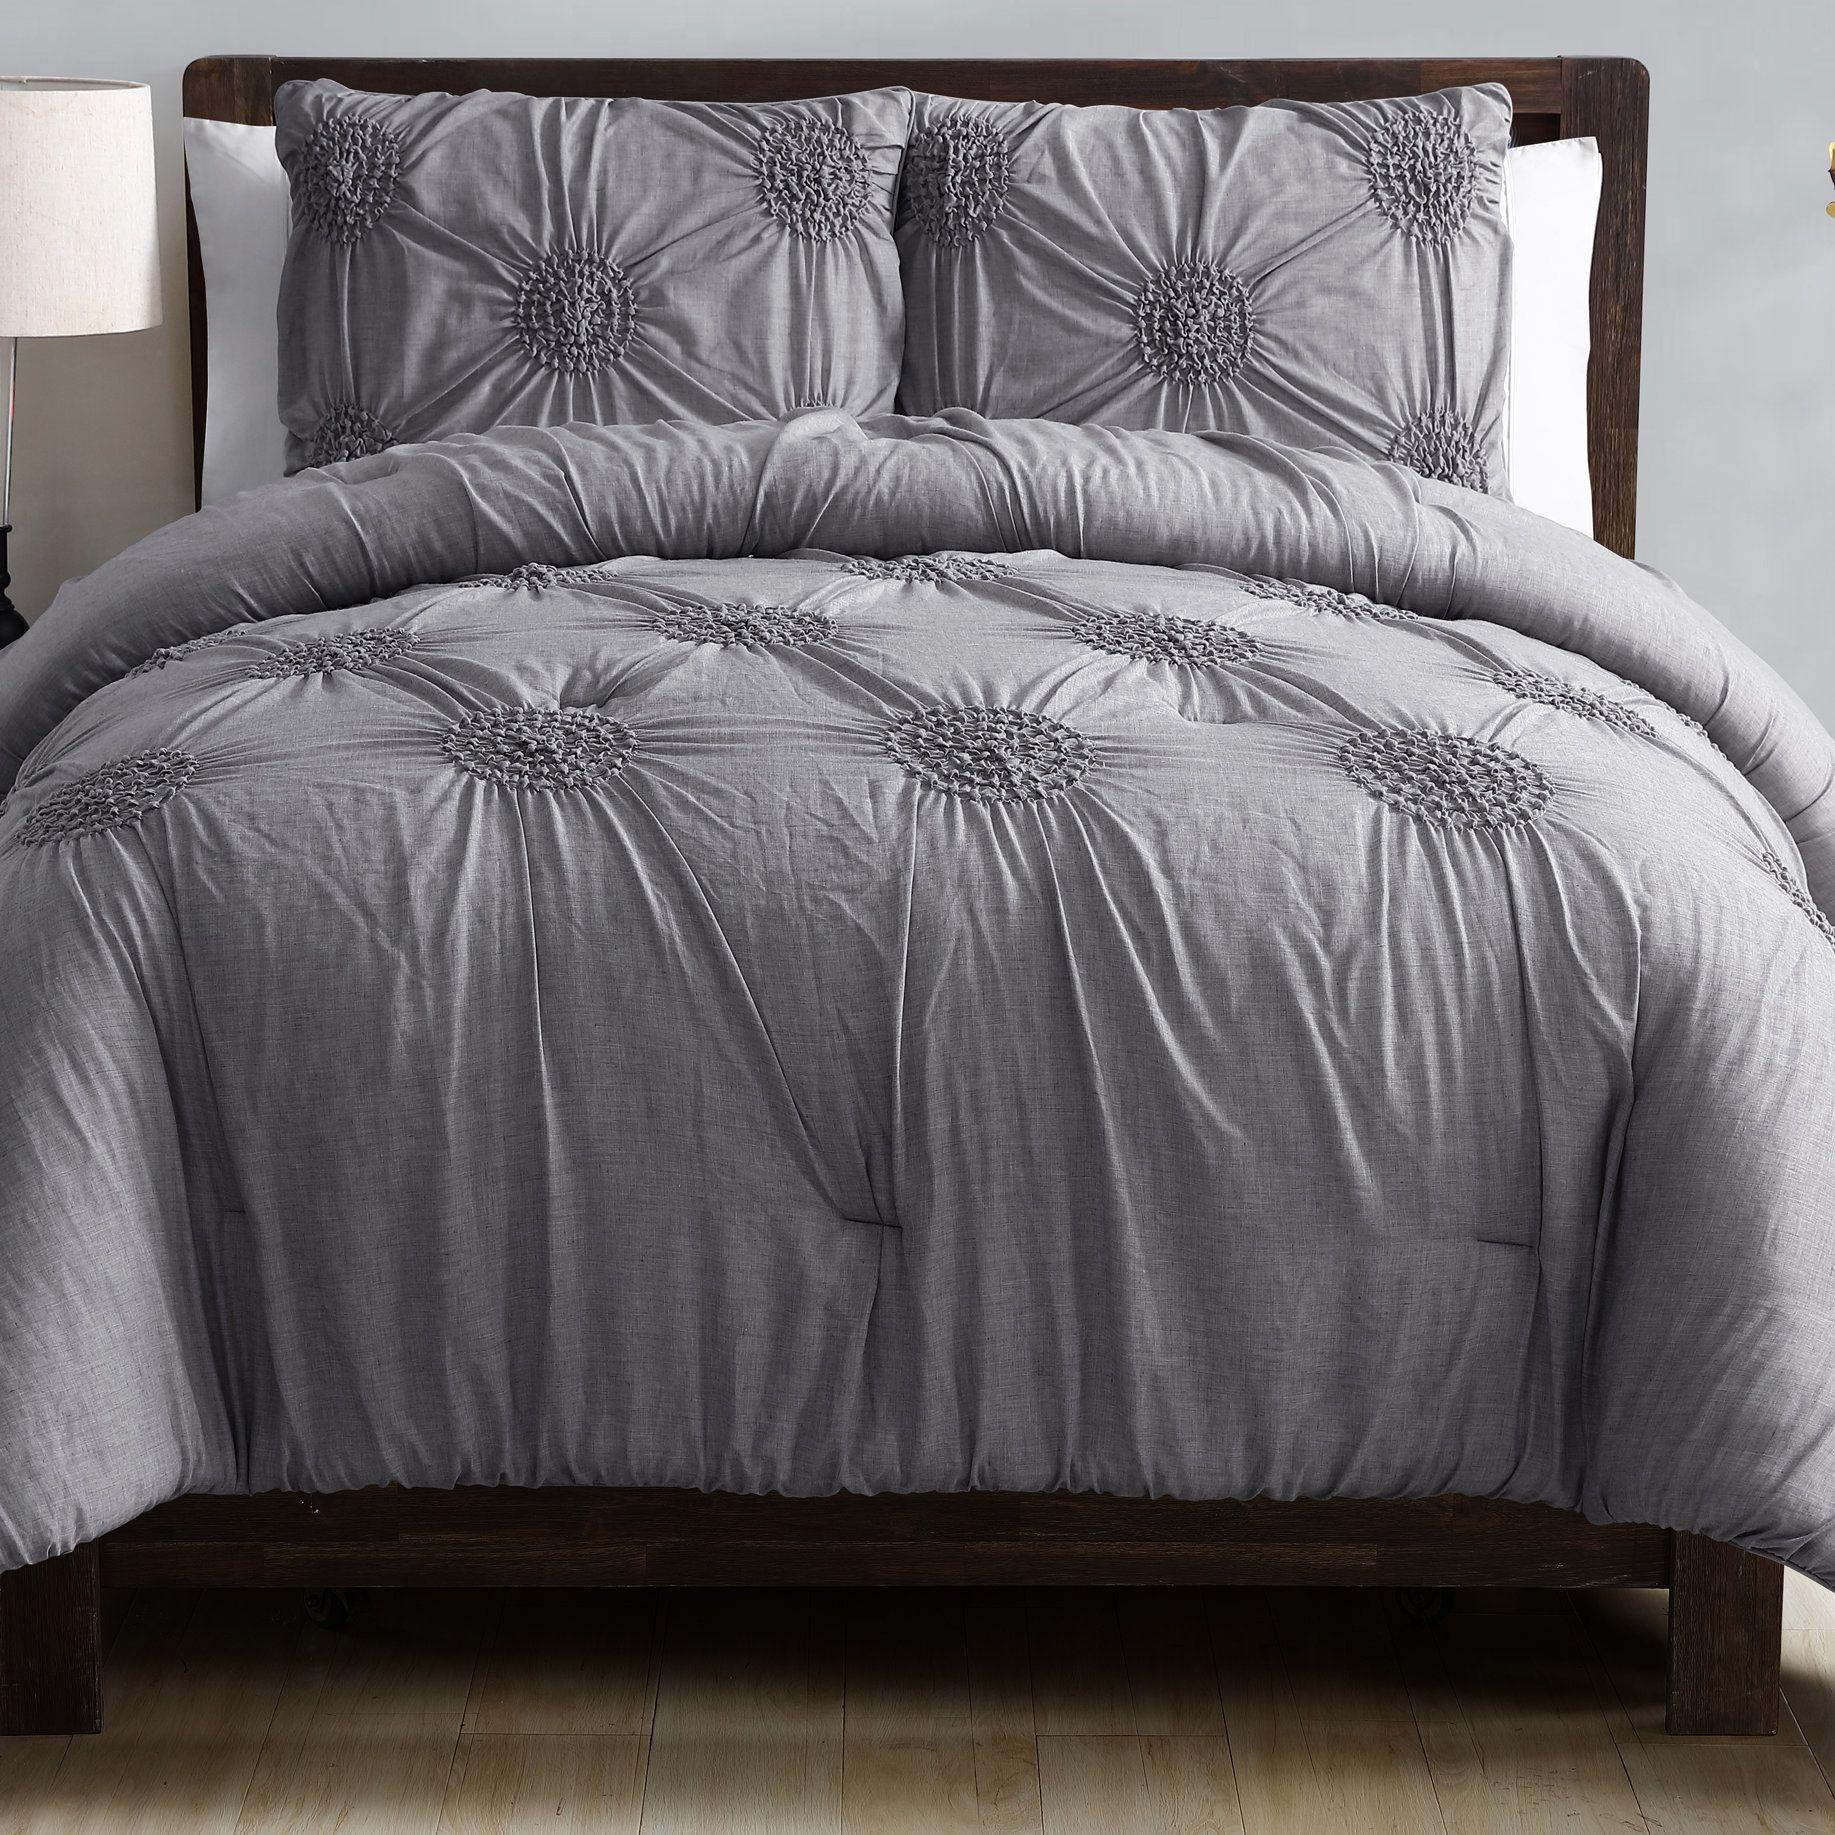 Goodwin 3 Piece Comforter Set Bedding Sets Comforter Sets Contemporary Bed